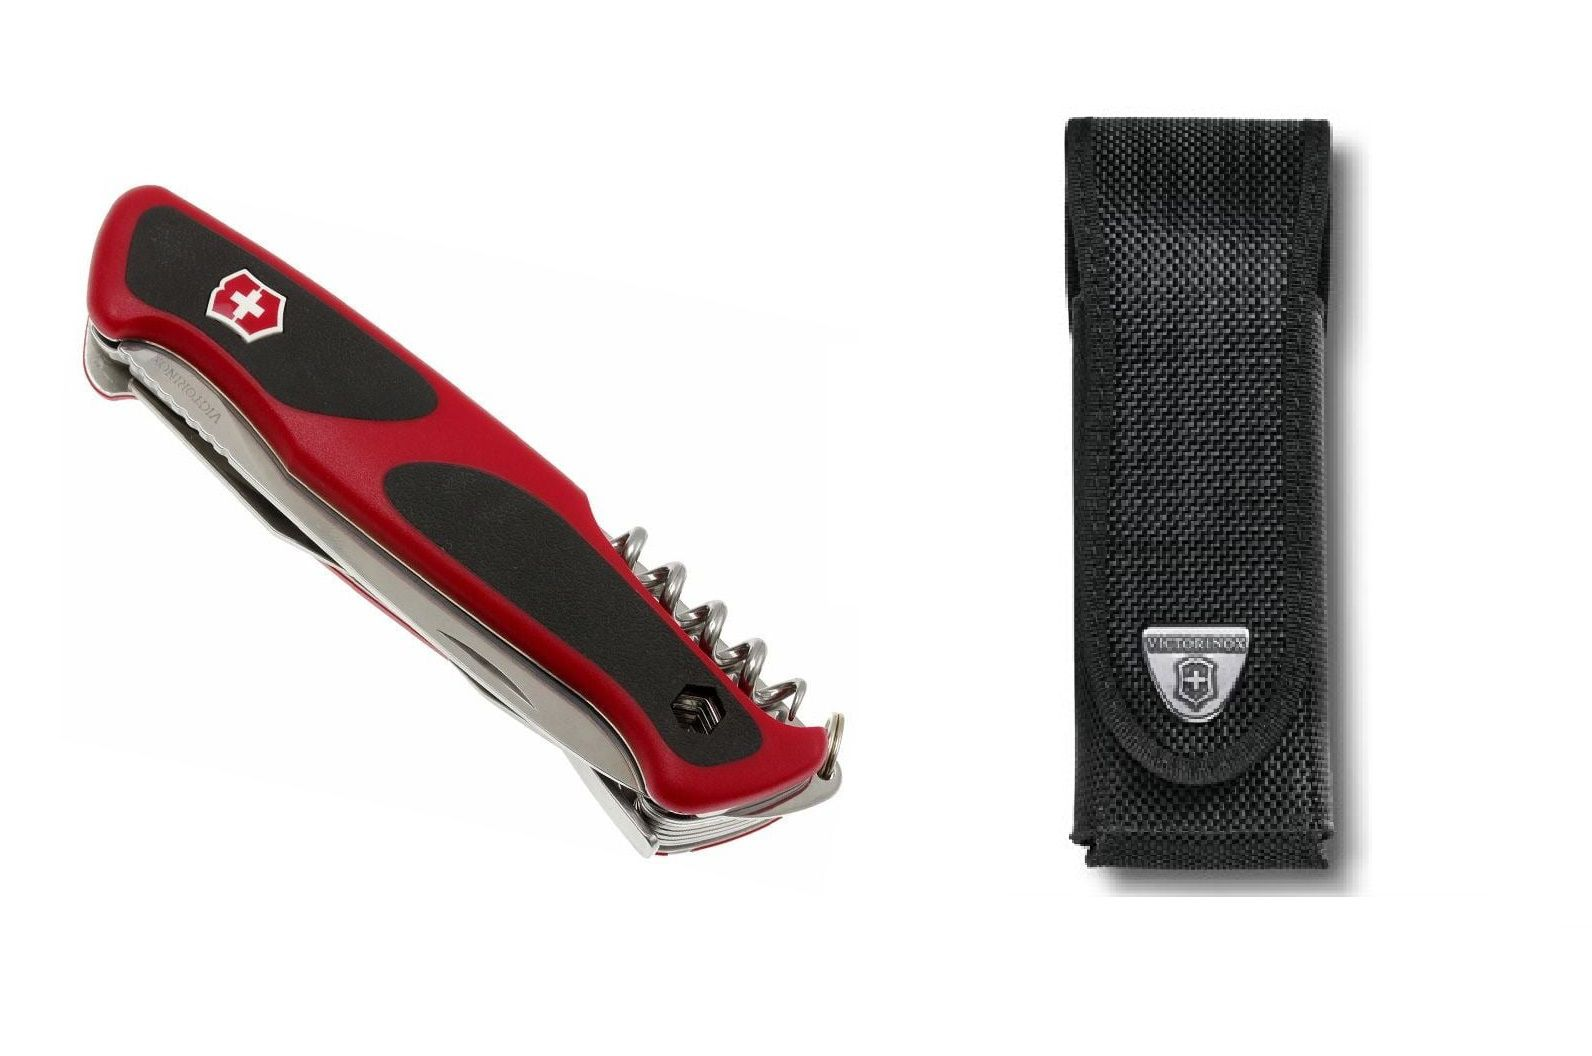 Canivete suíço Ranger Grip 174 Handyman 17 funções Victorinox 0.9728.WC  - Mix Eletro